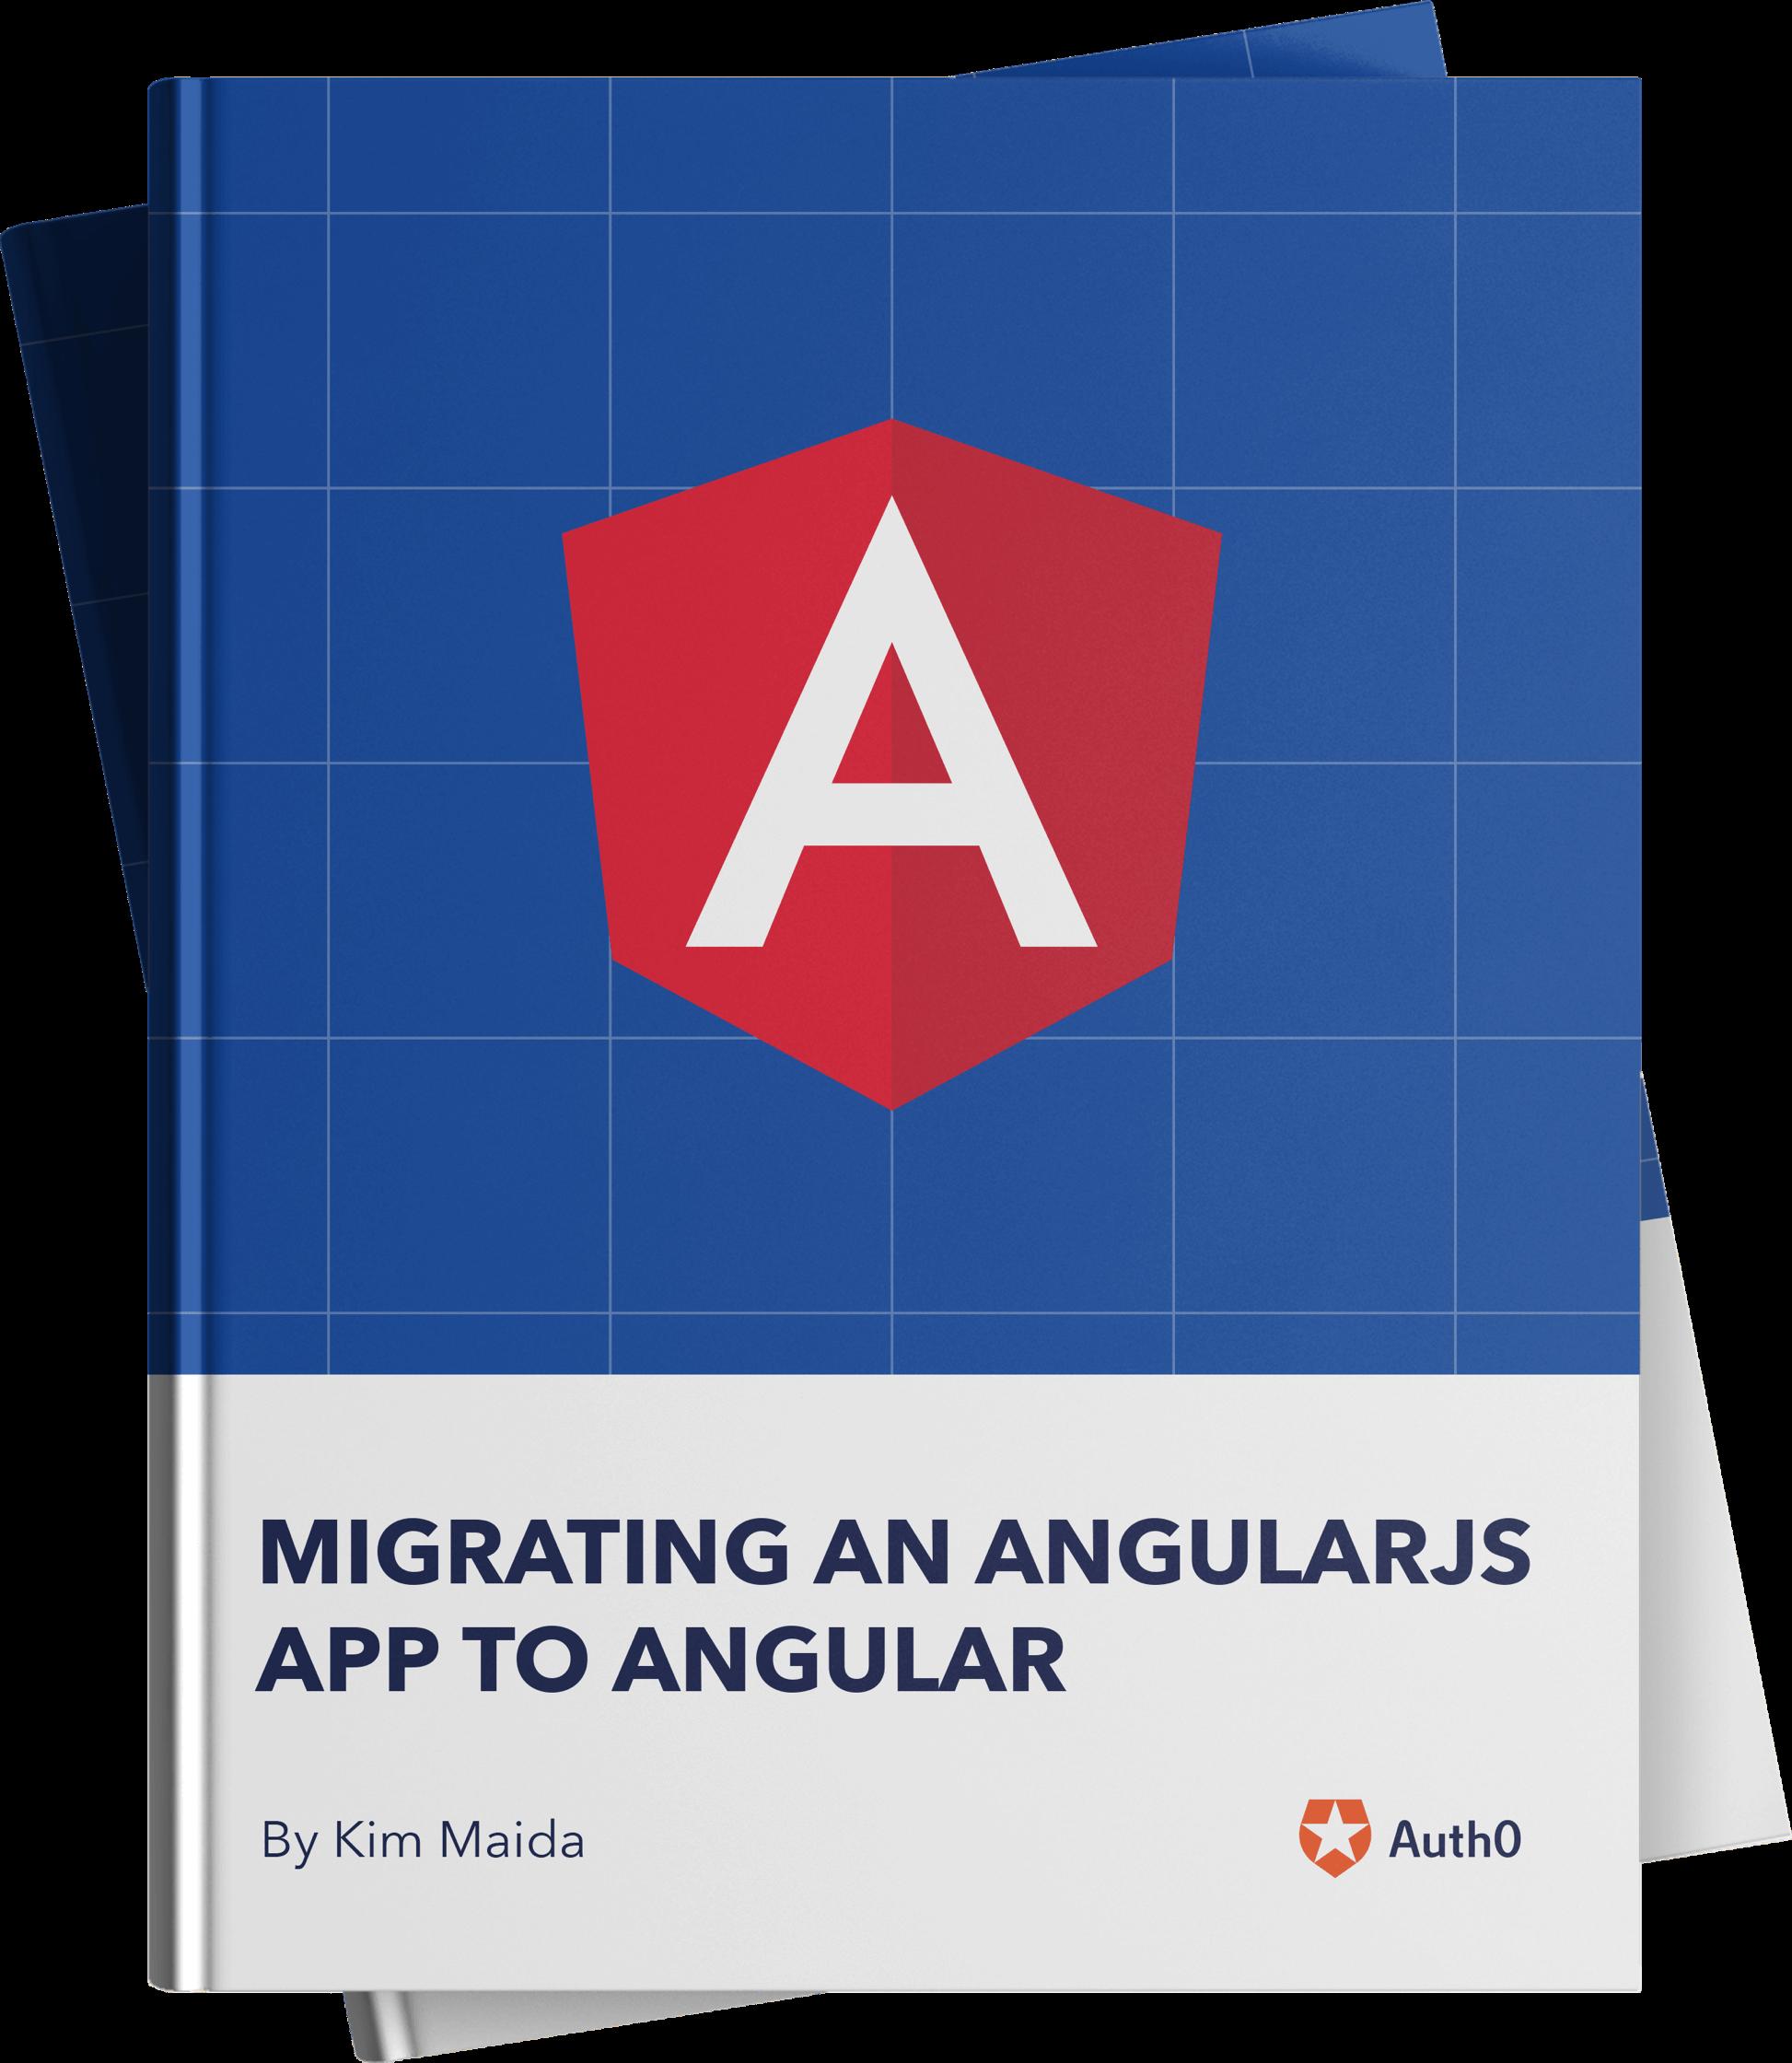 Migrating an AngularJS App to Angular